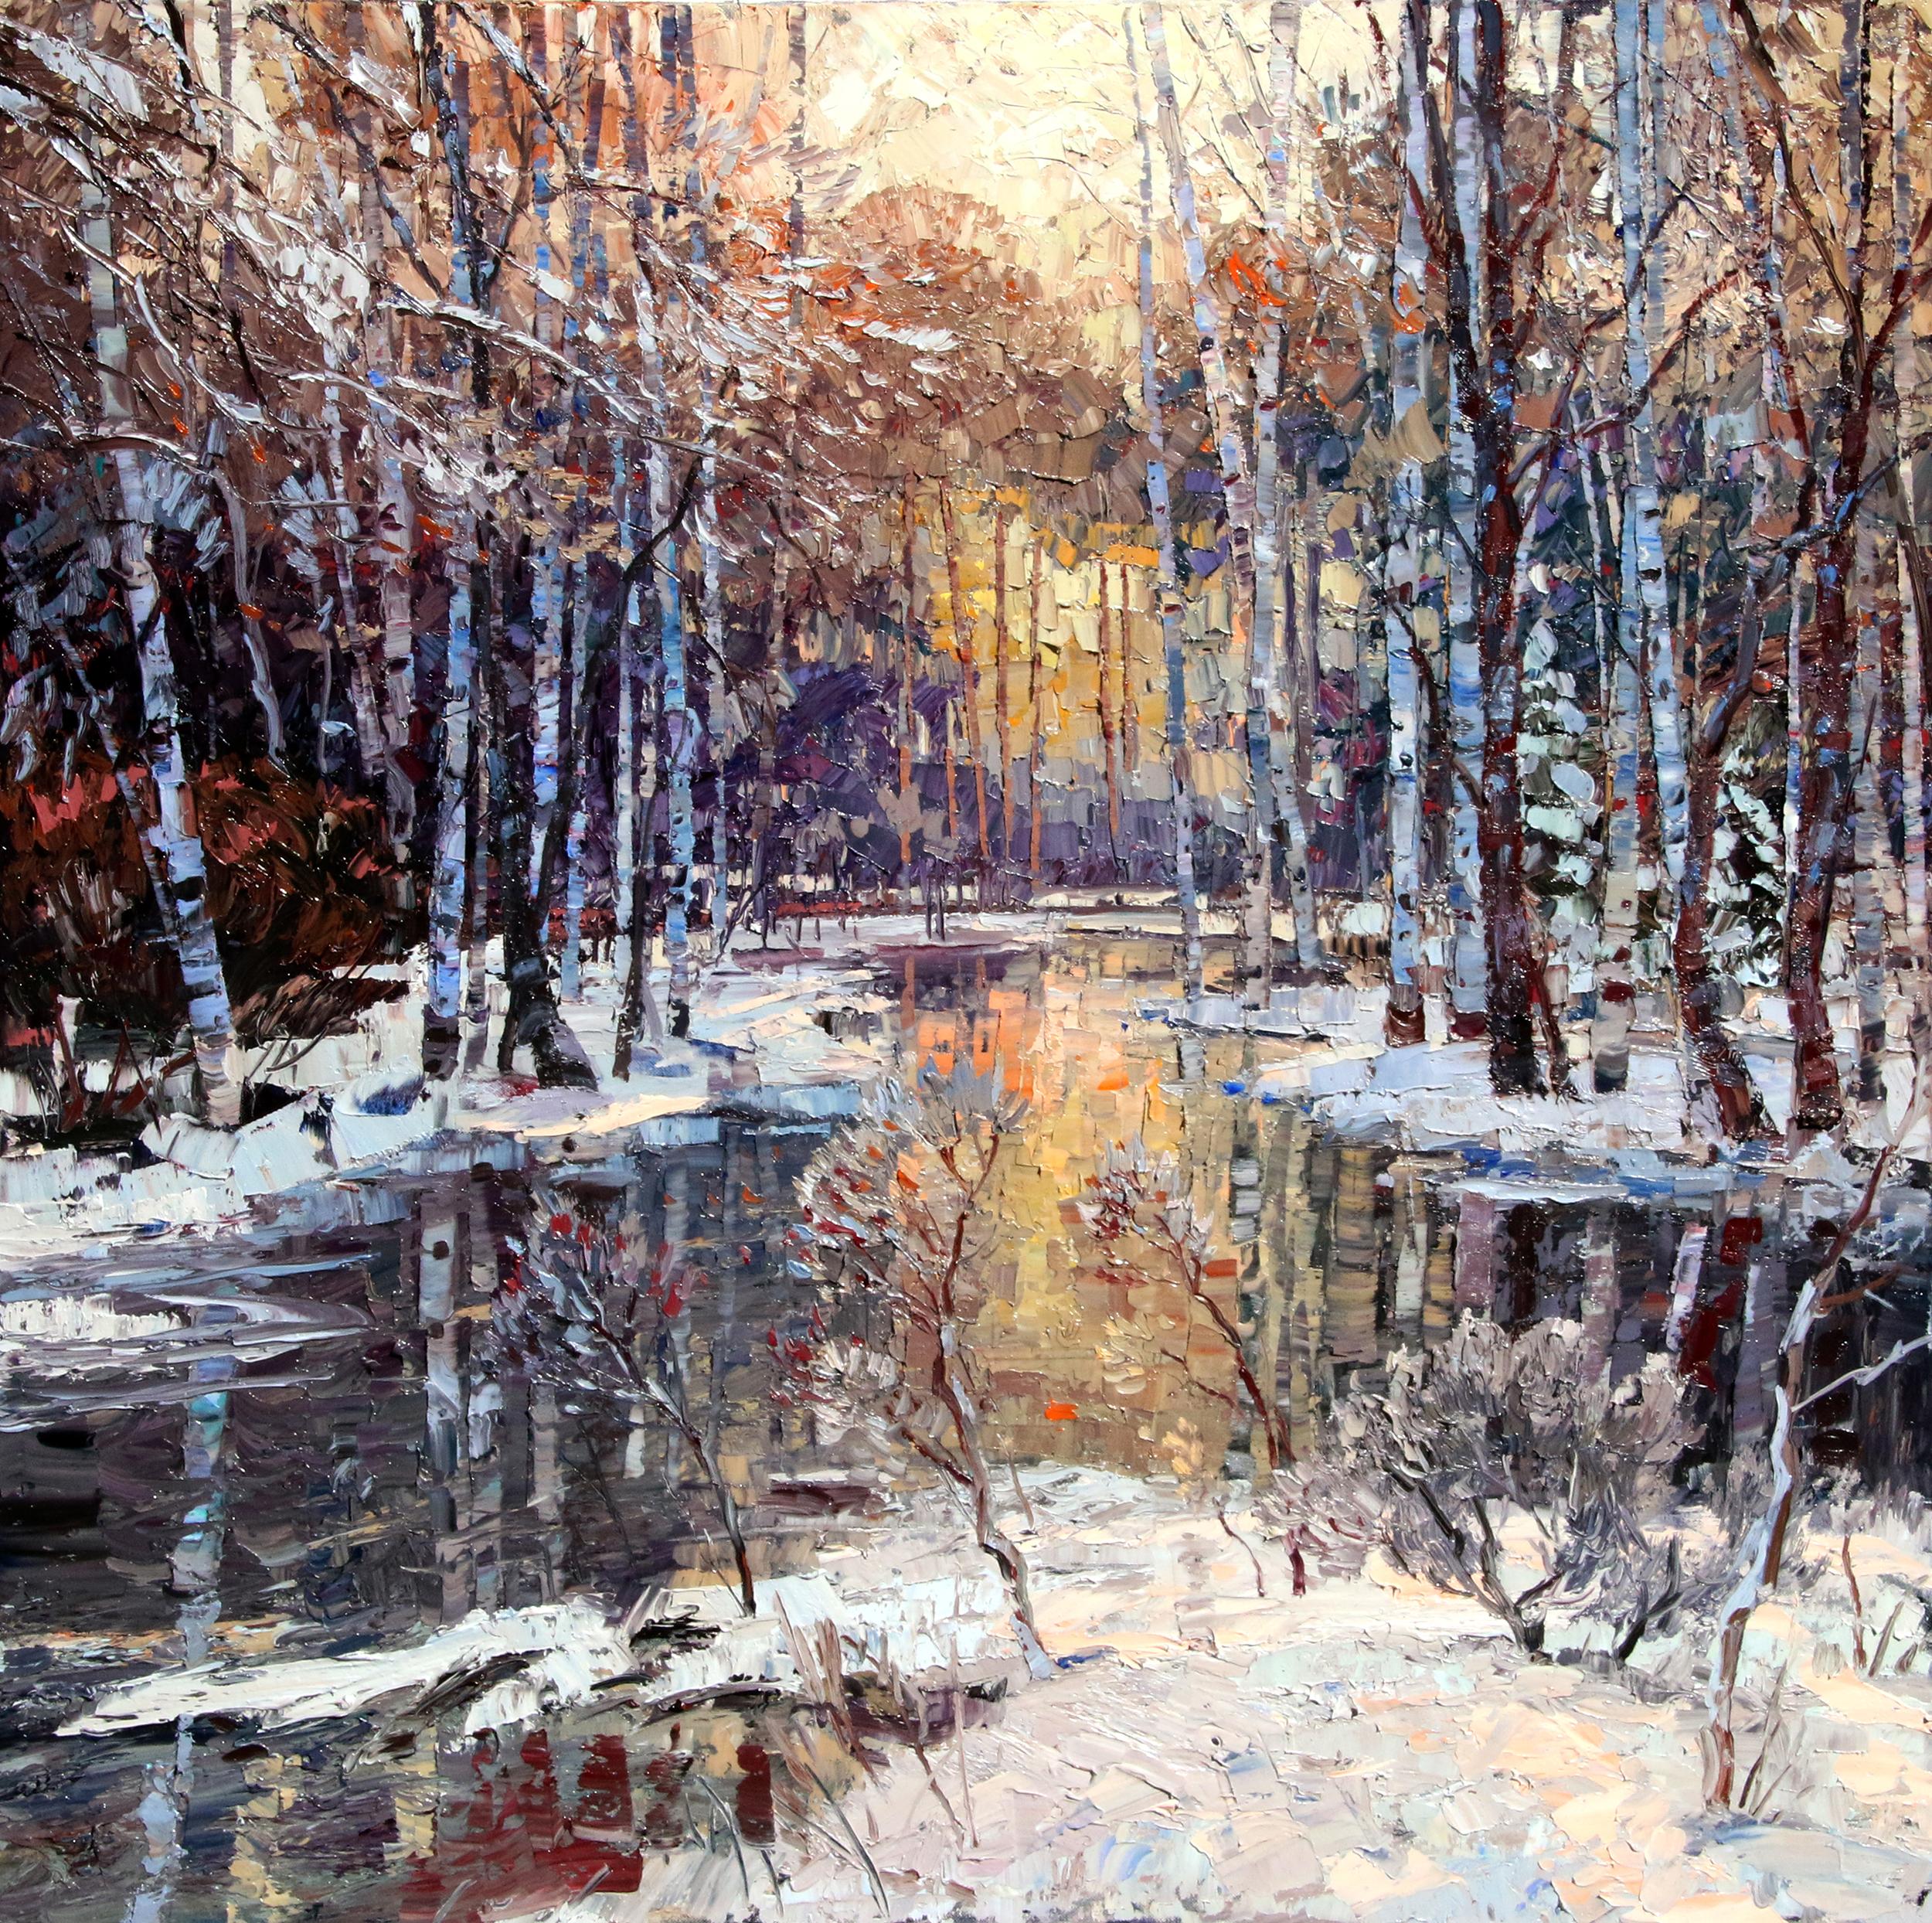 winters_peace_40x40.jpg